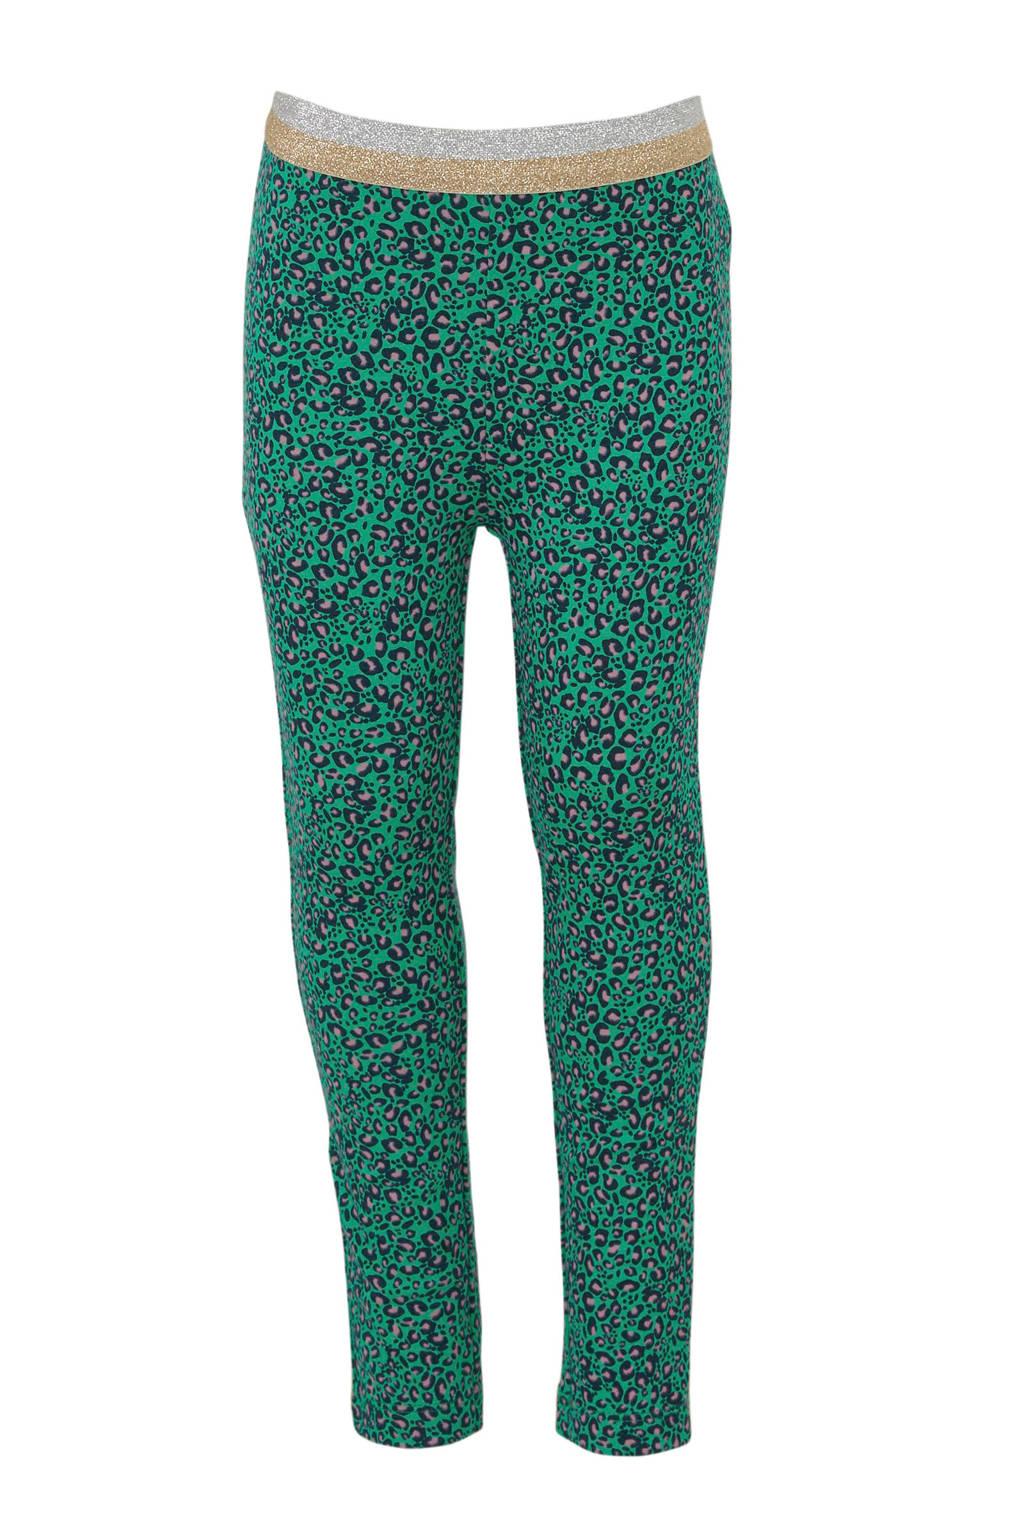 Quapi legging Annebel met panterprint groen/donkerblauw, Groen/donkerblauw